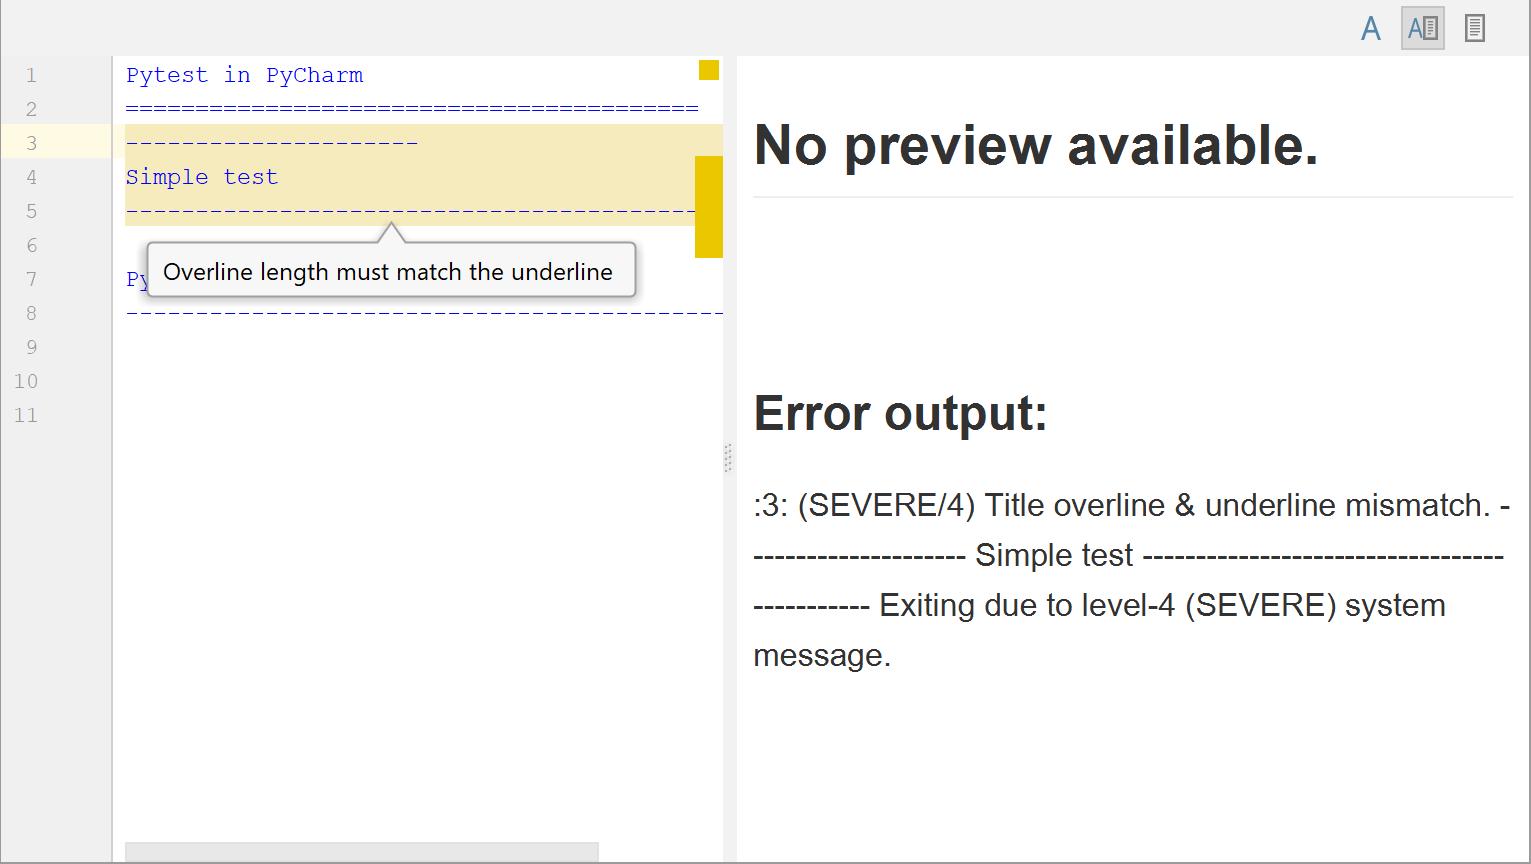 Markup error detected